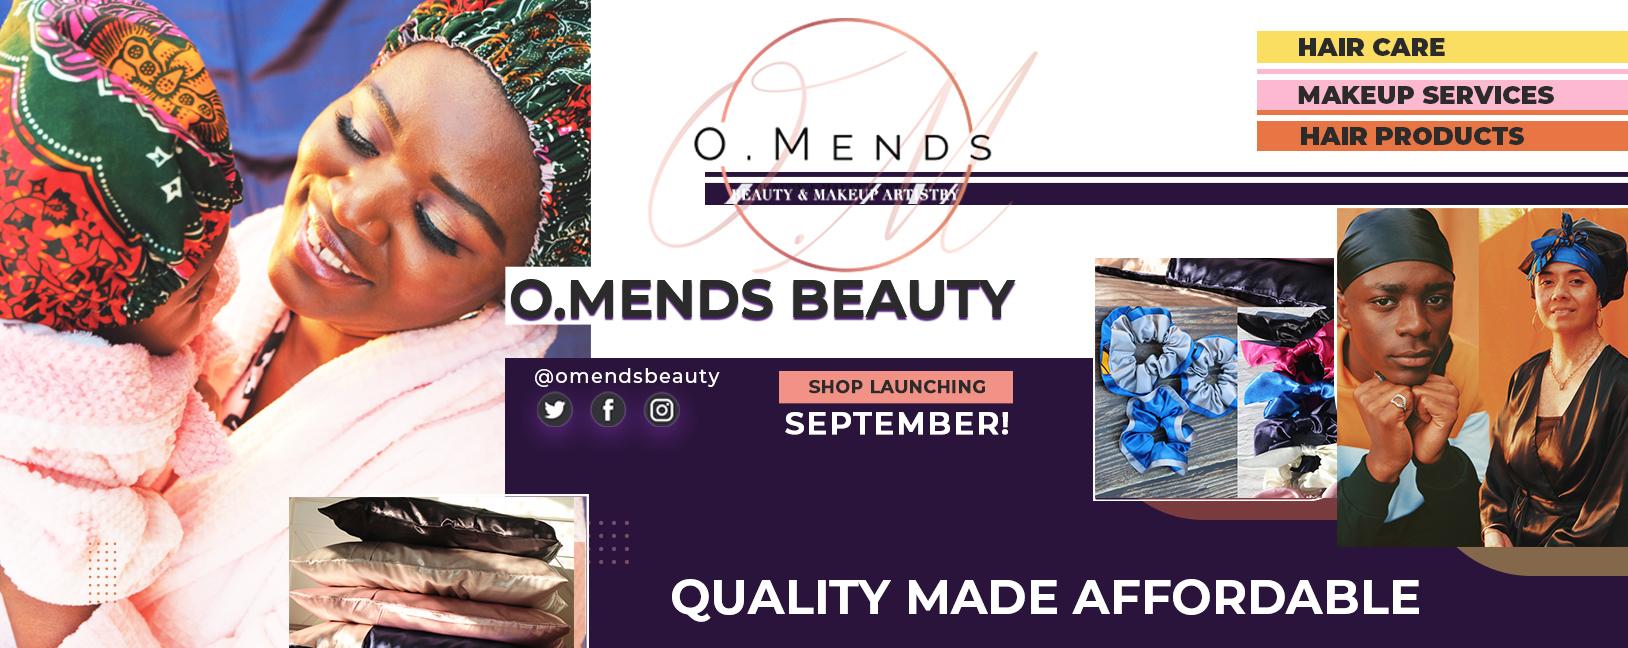 branding-omends-beauty-cover